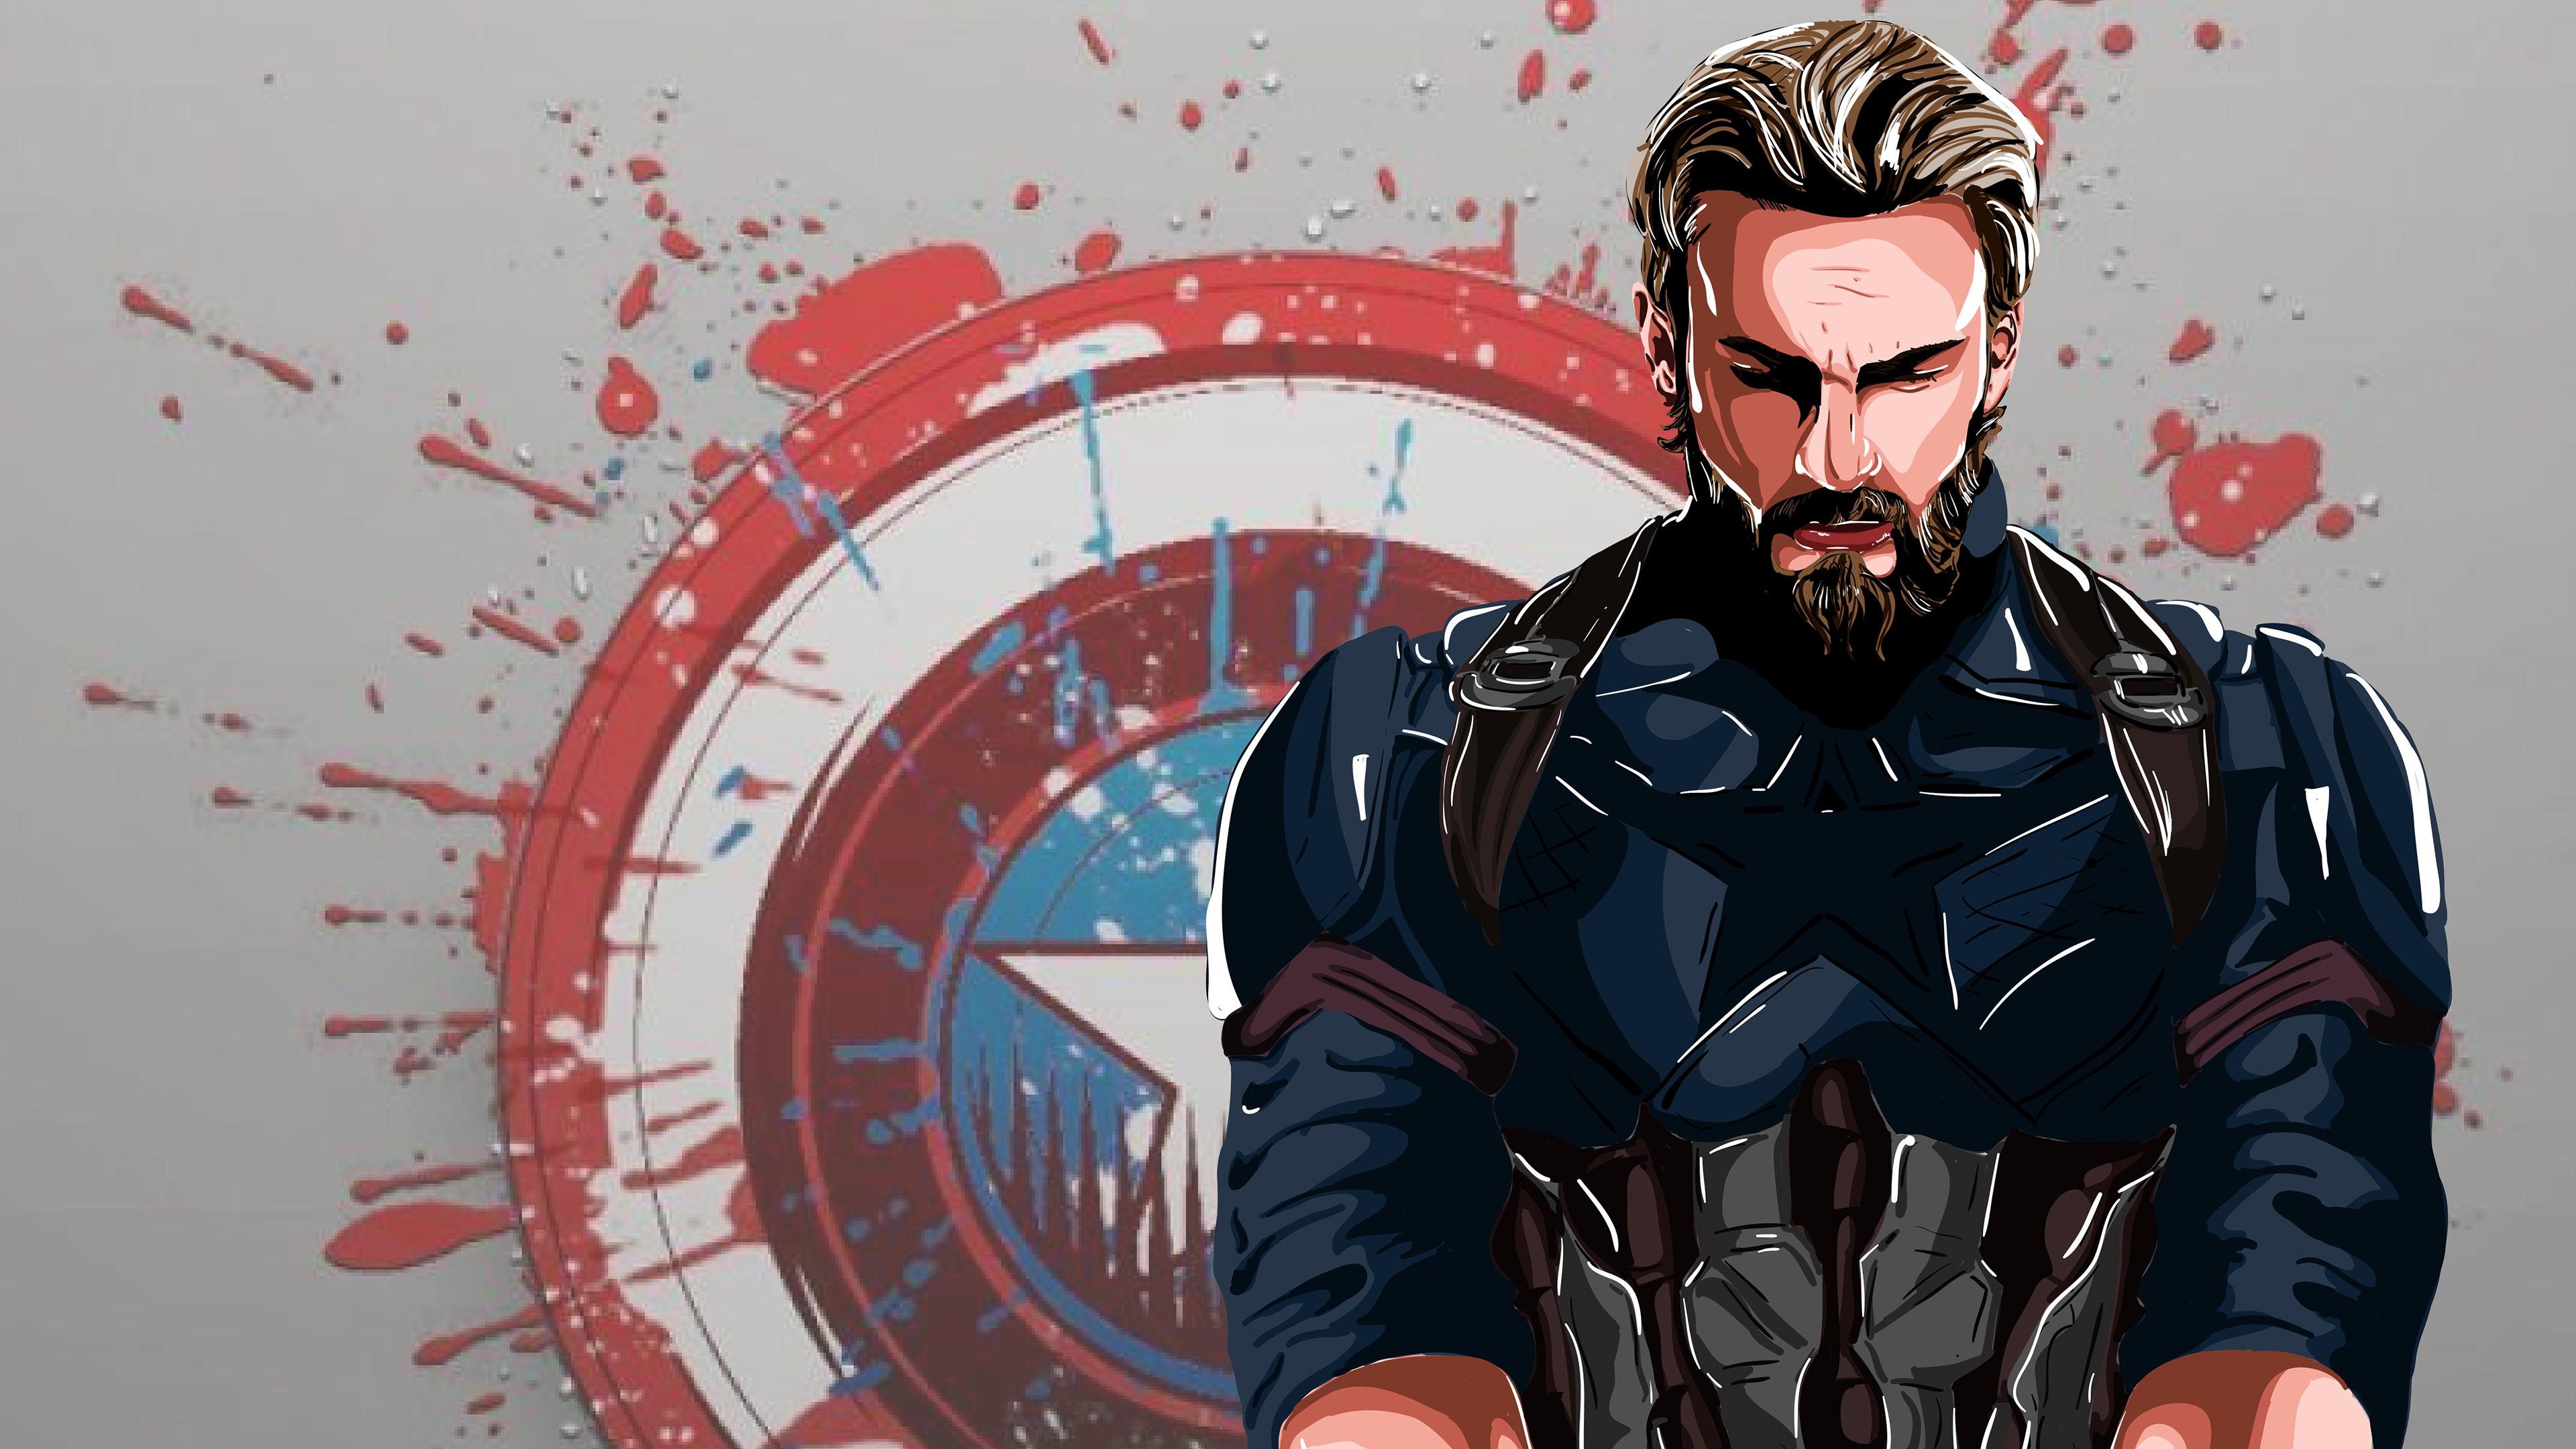 Captain America New Art 4k Hd Superheroes 4k Wallpapers